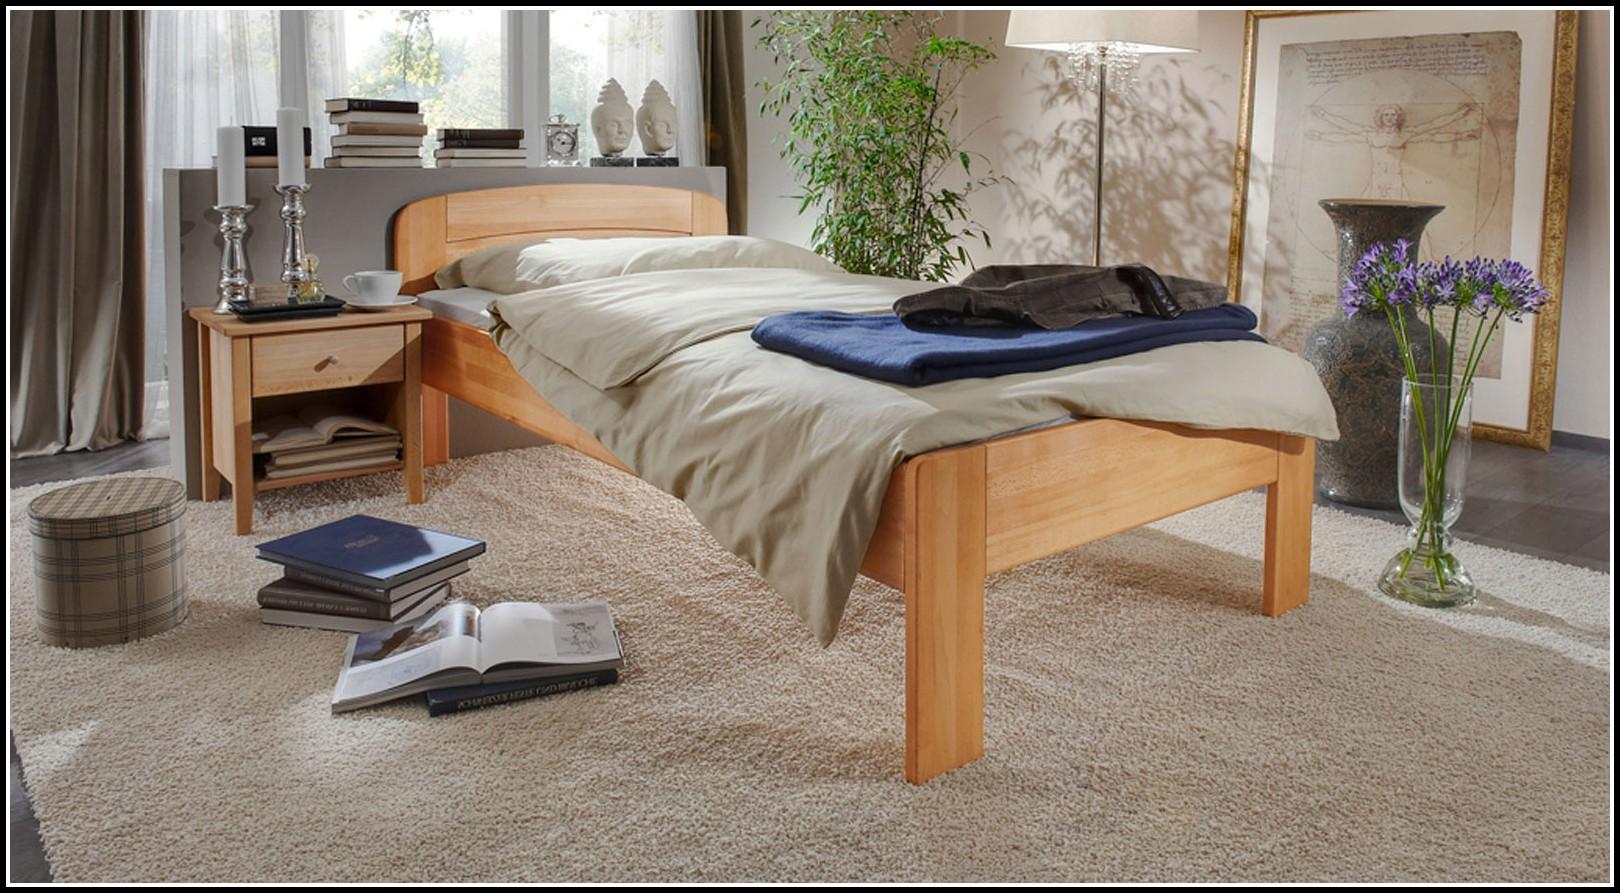 ikea bett 100 x 200 betten house und dekor galerie dgwjdzdrba. Black Bedroom Furniture Sets. Home Design Ideas